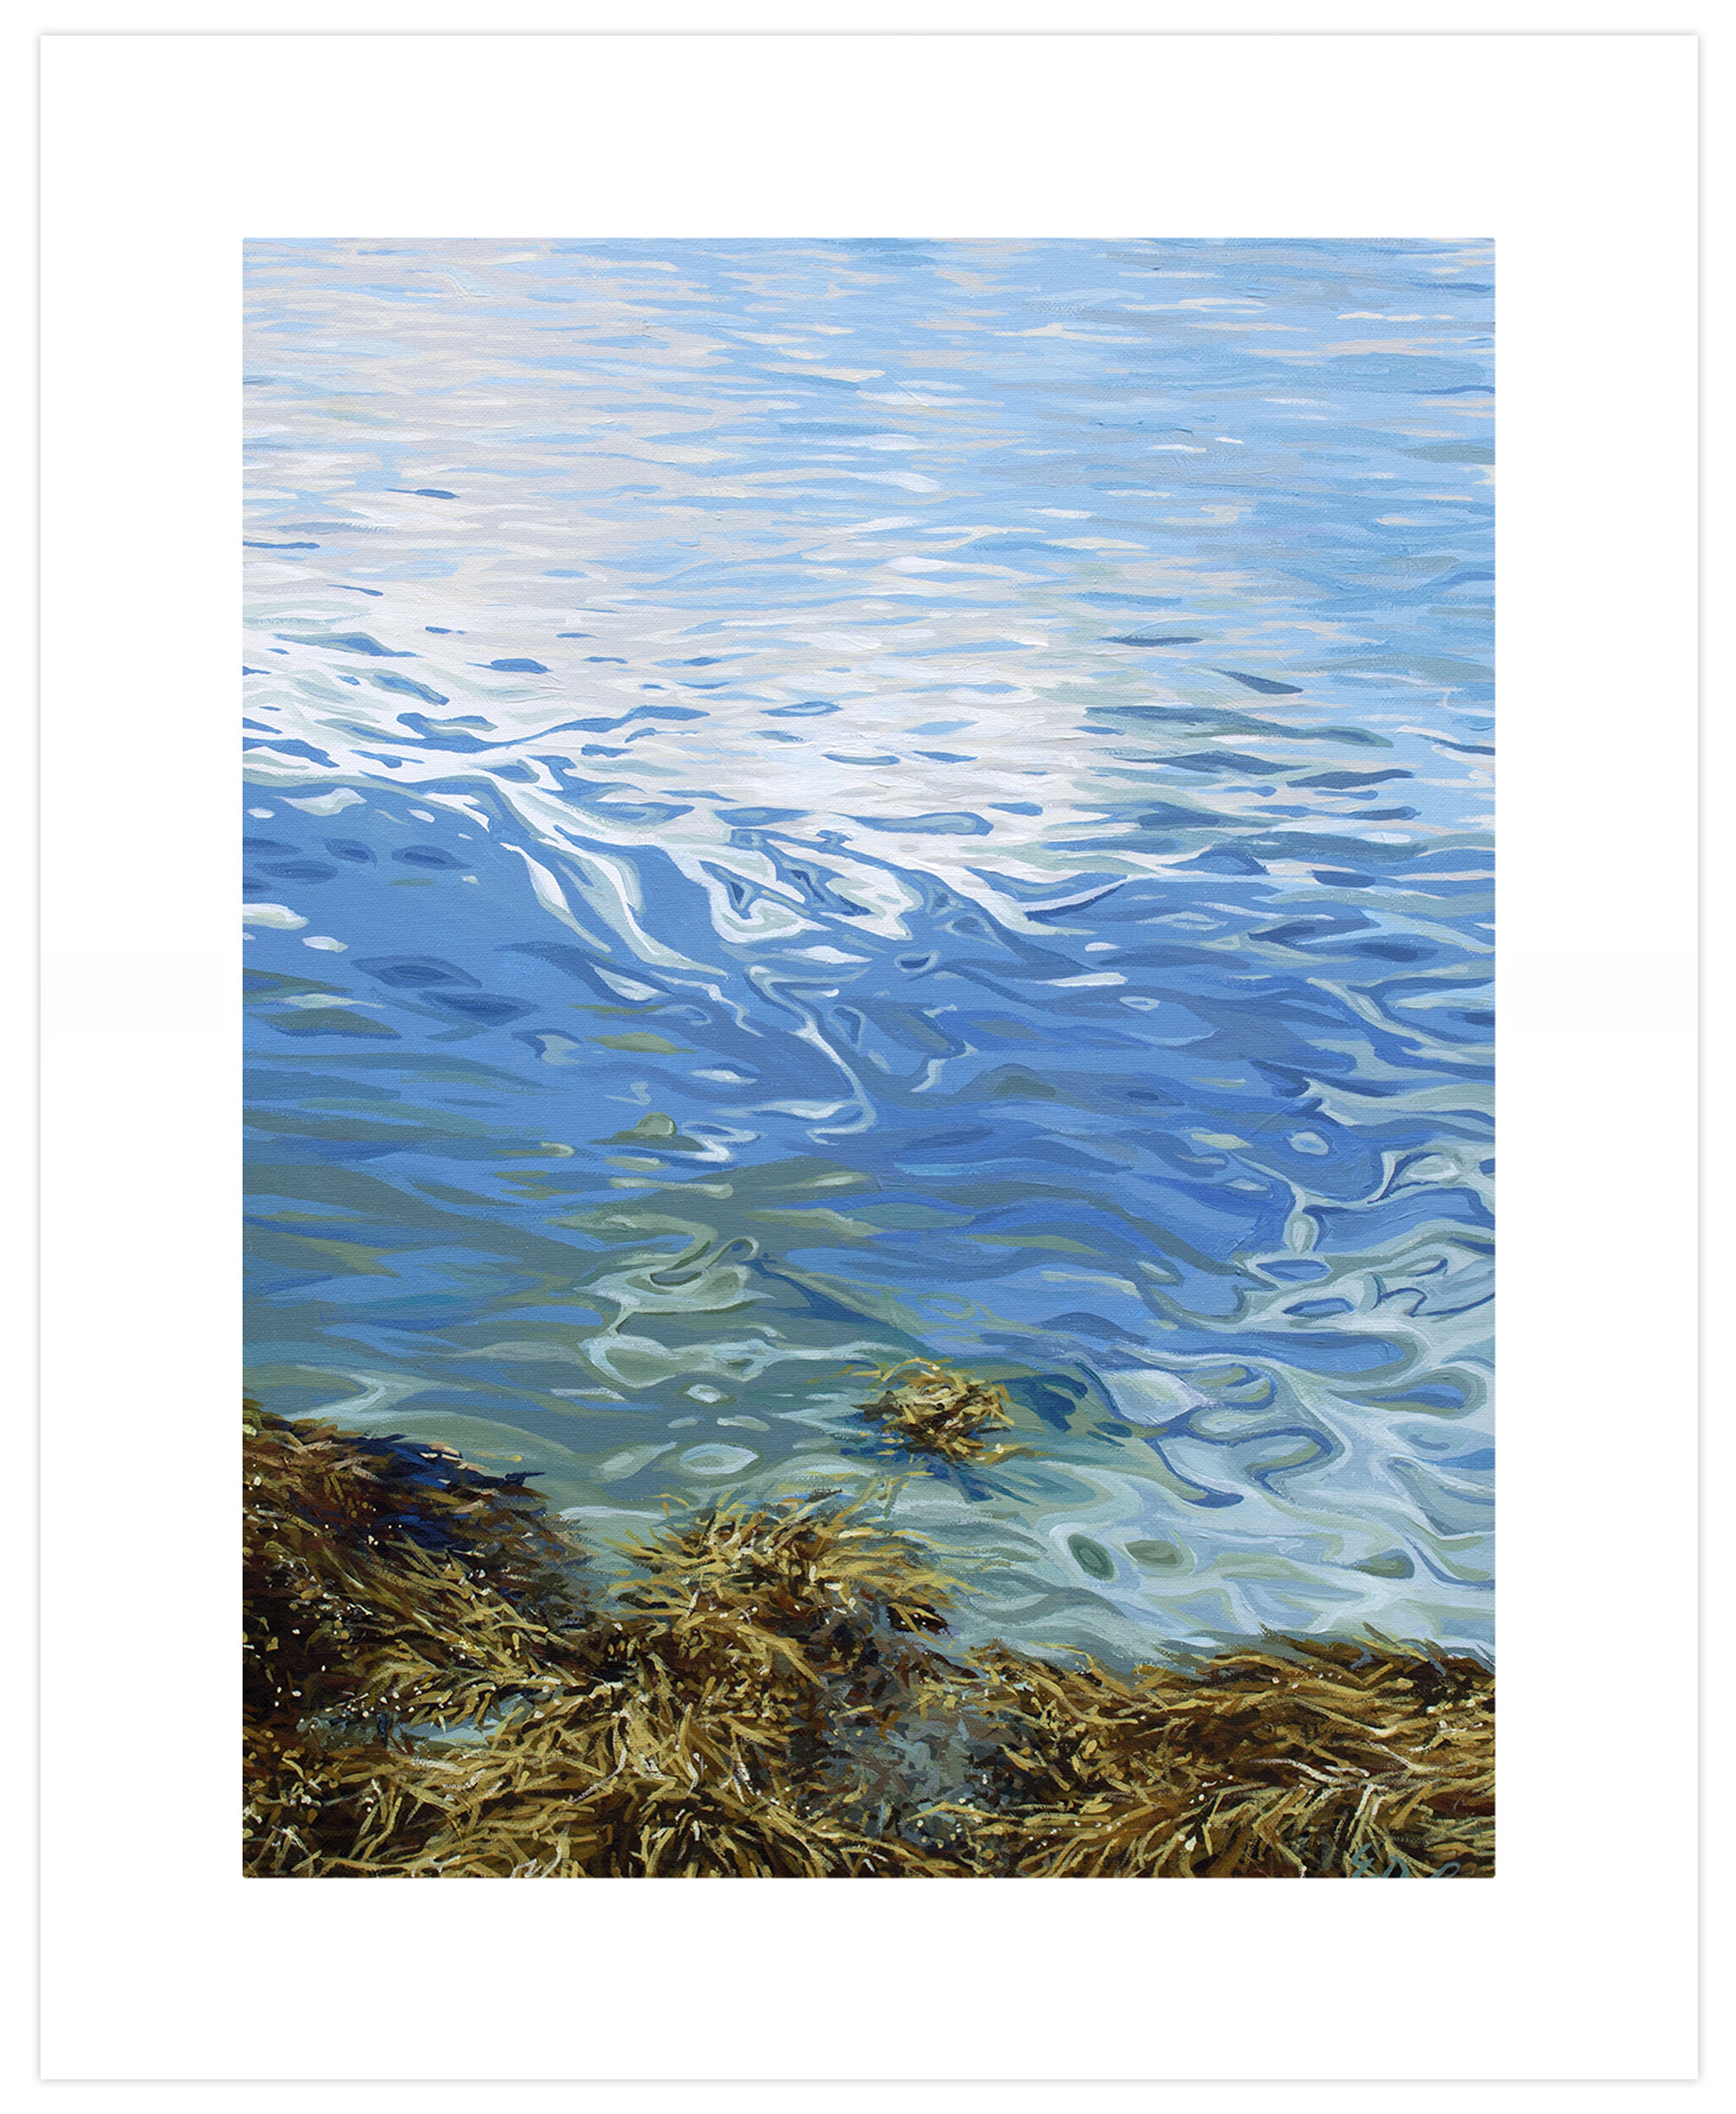 Greenbox Art Seaweed Acrylic Painting Print On Paper In Blue